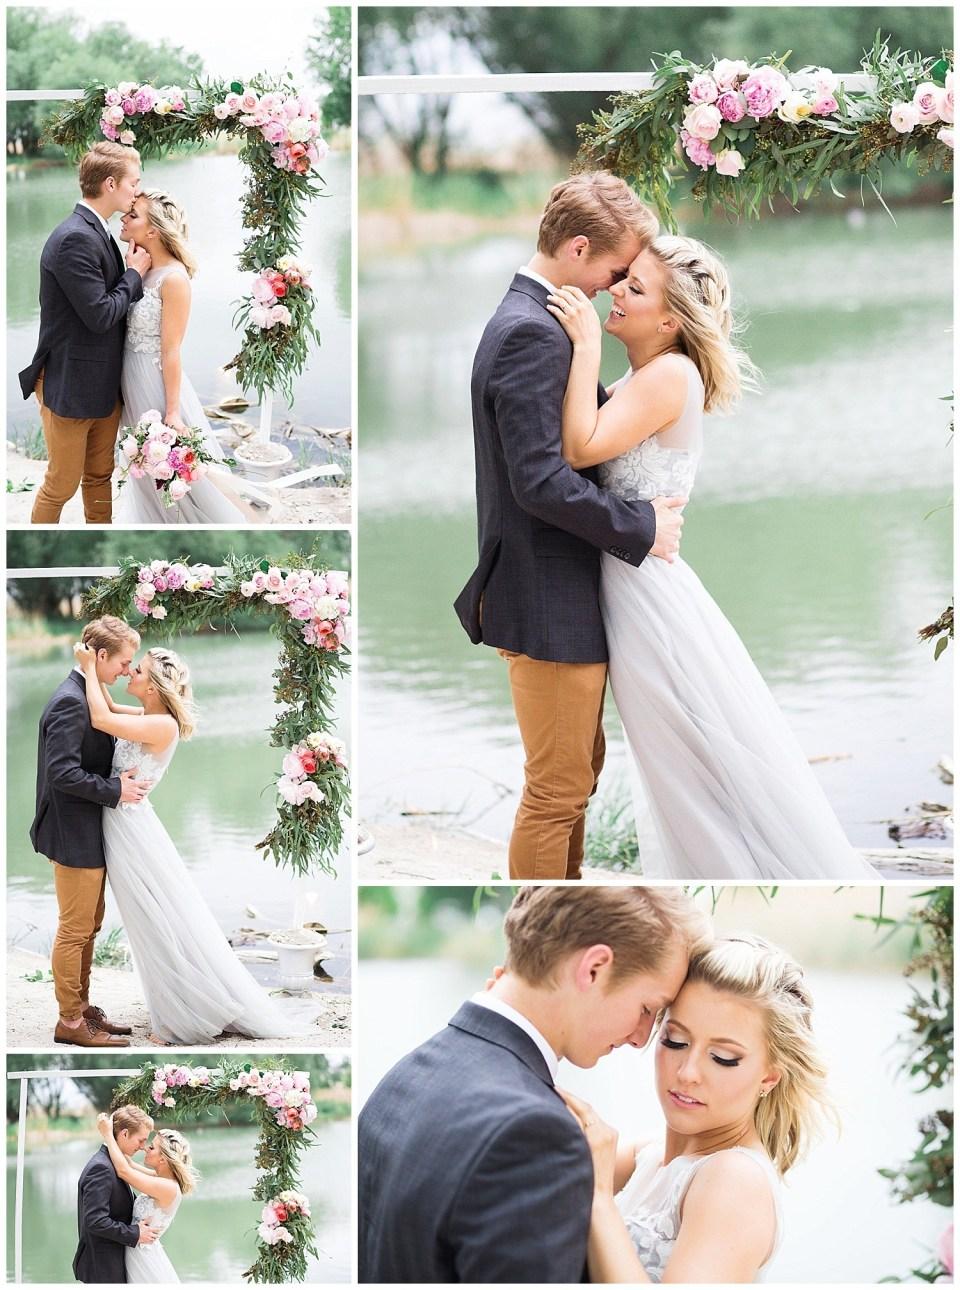 Lakeside Elopement Lake Wedding Ideas